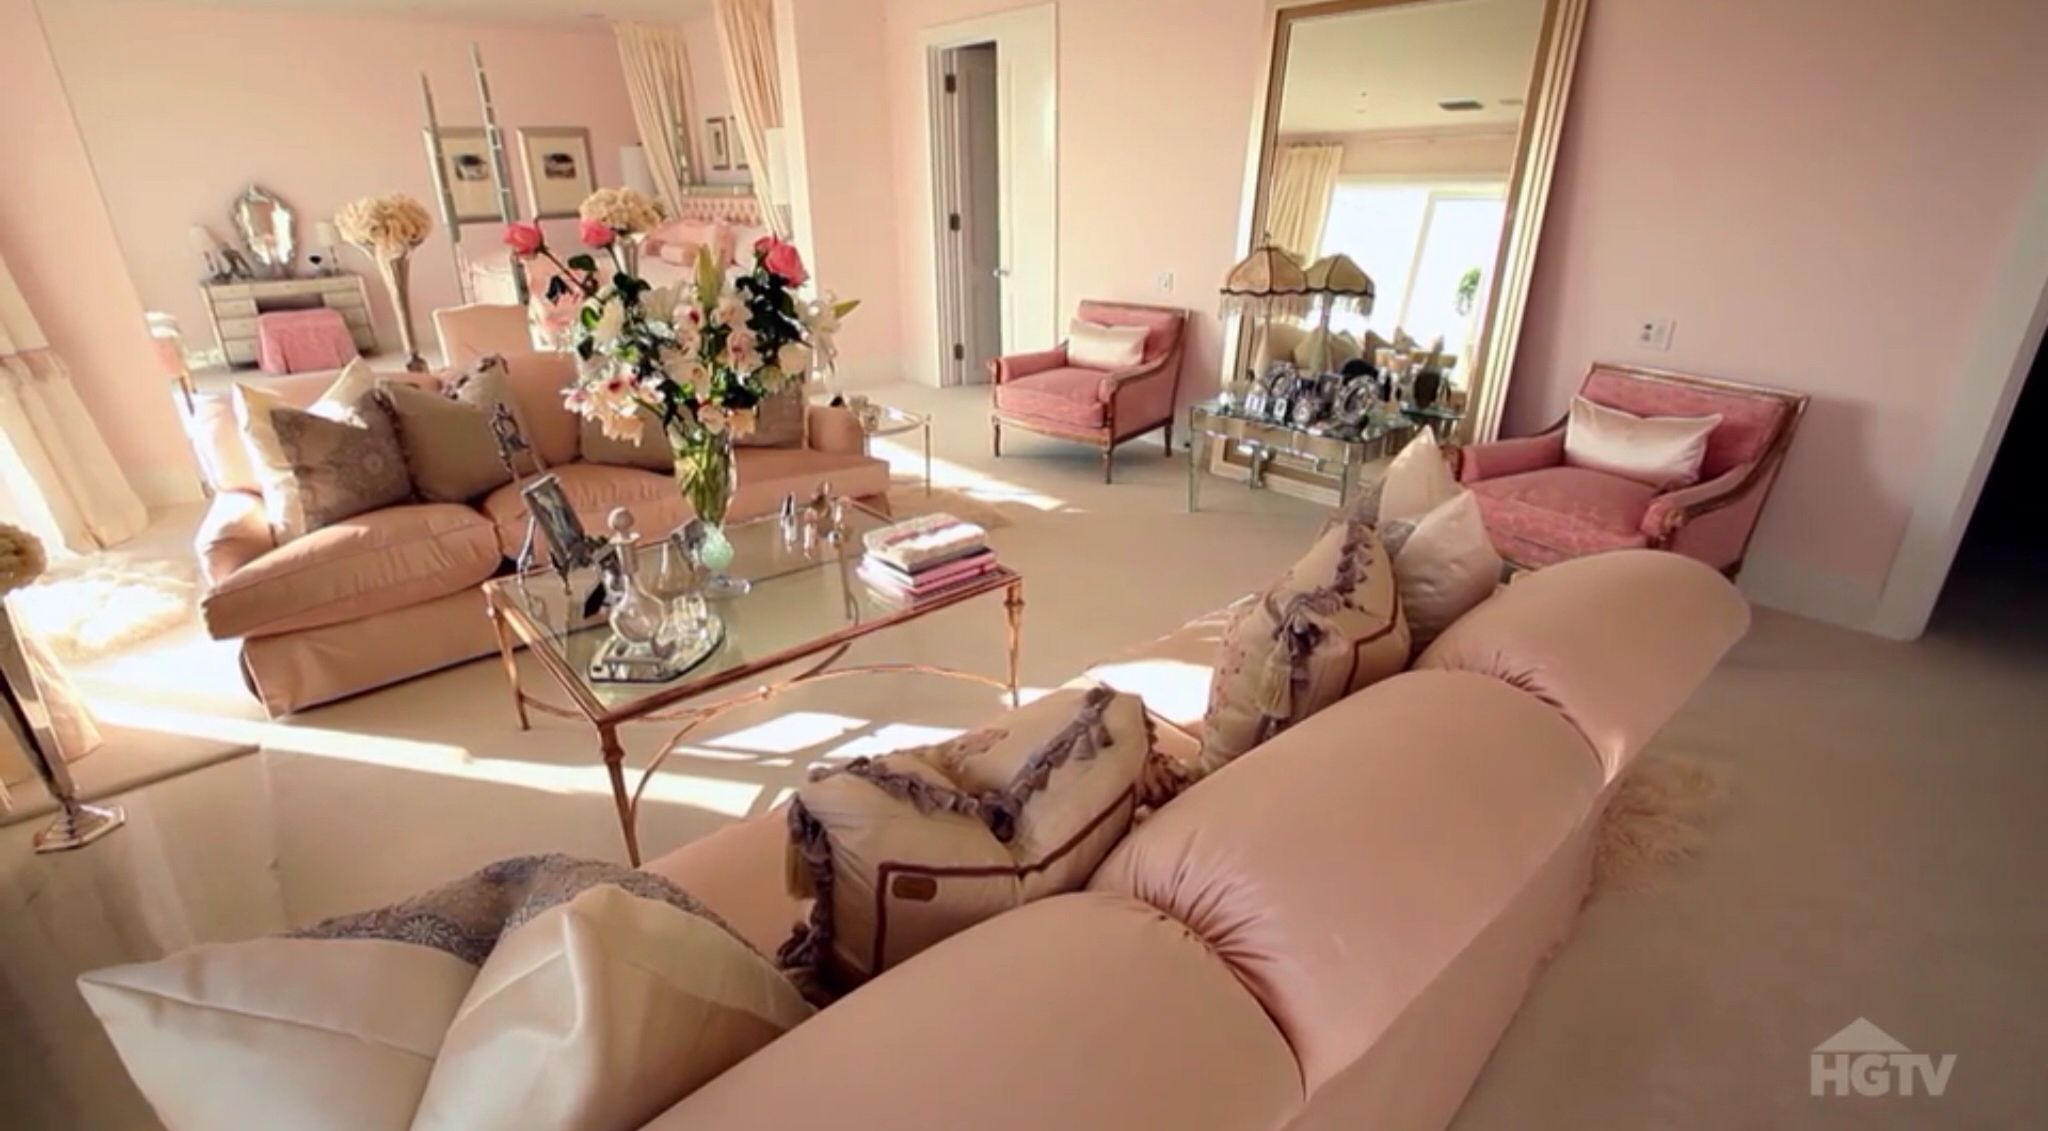 Villa Rosa Master Bedroom Sitting Area Lisa Vanderpump Home